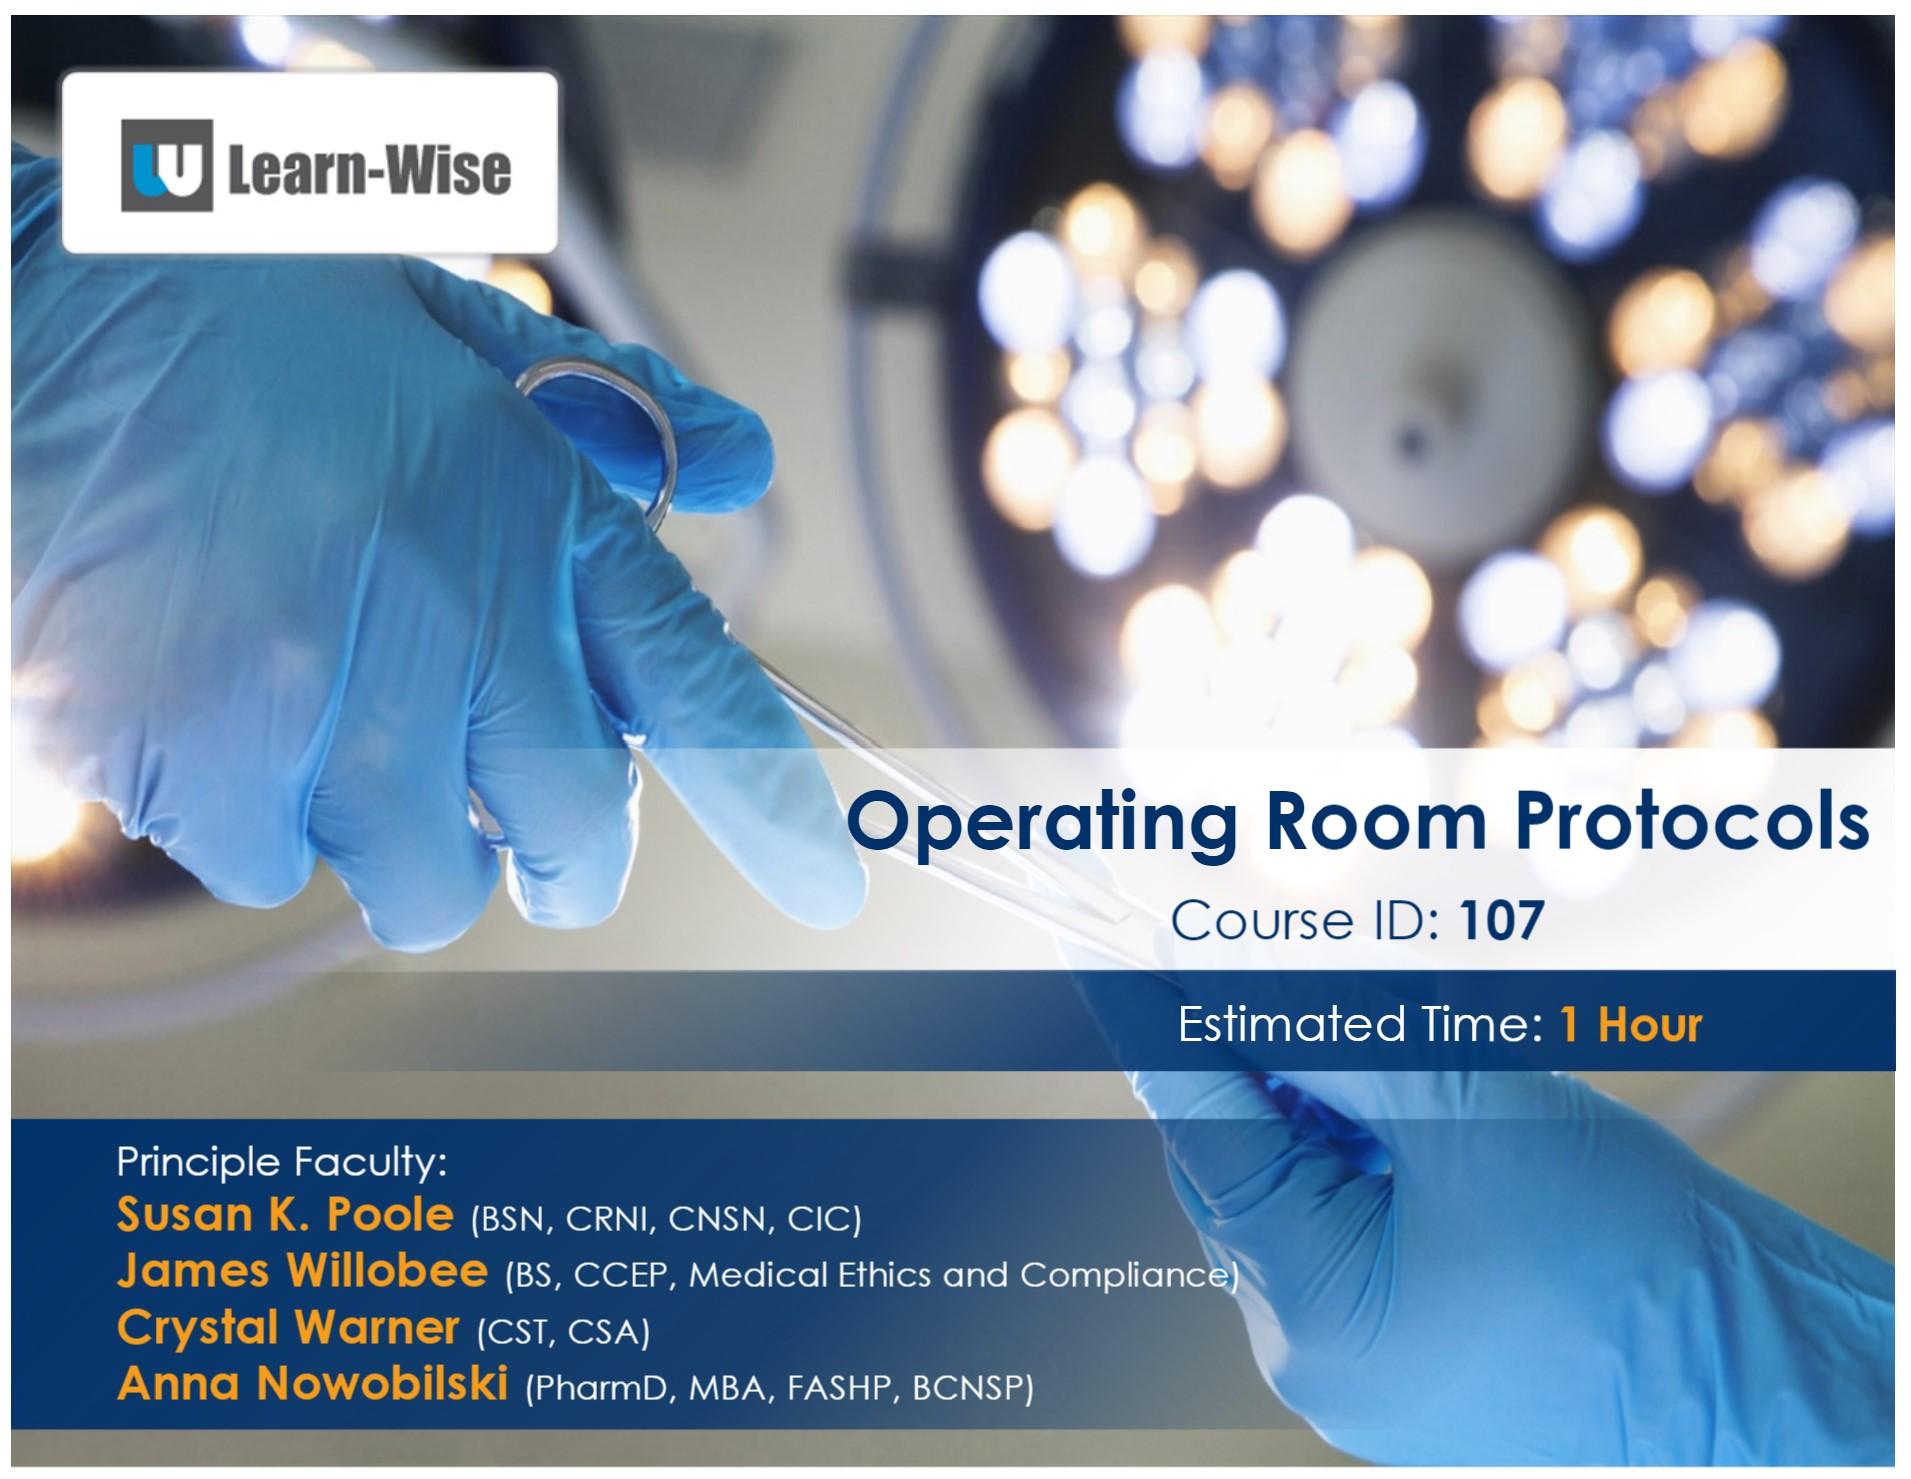 Operating Room Protocol